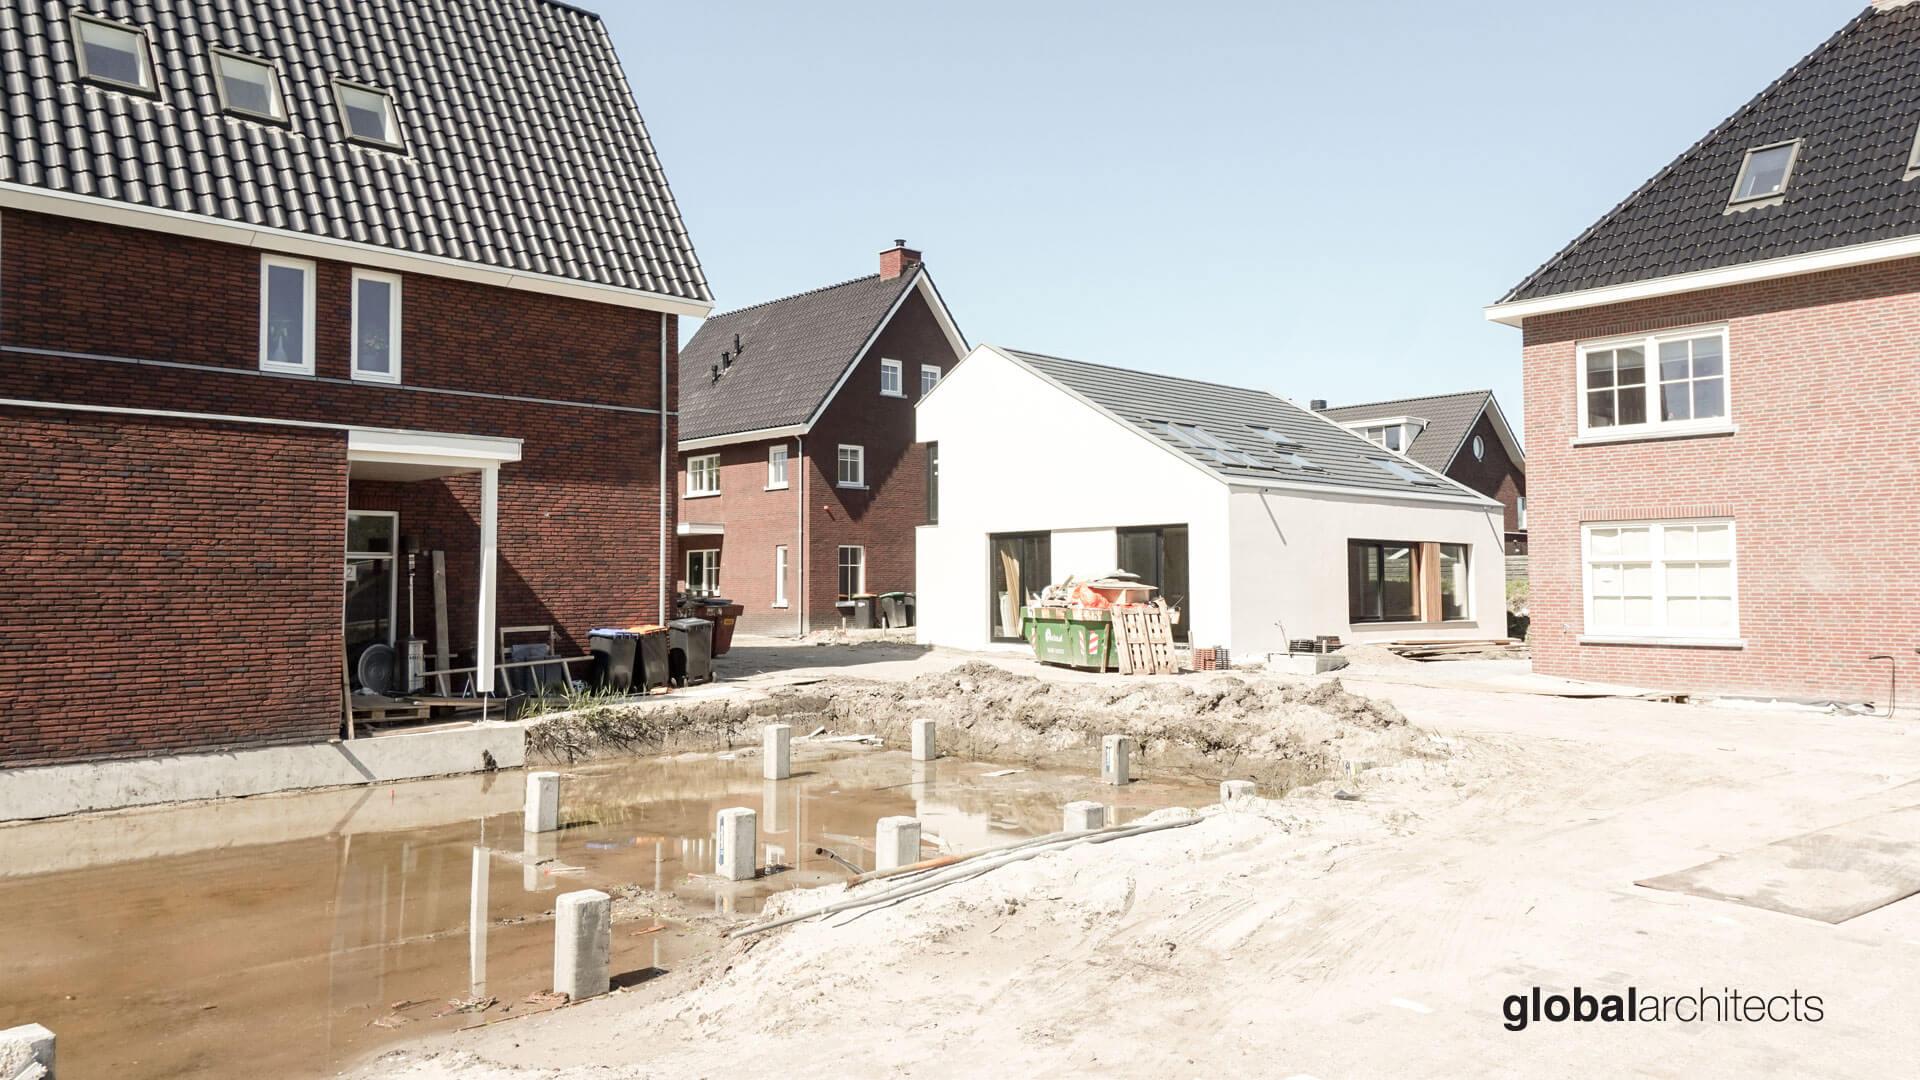 Architectenbureau Den Haag : Villa den haag architect architectenbureau duurzaam zelfbouw